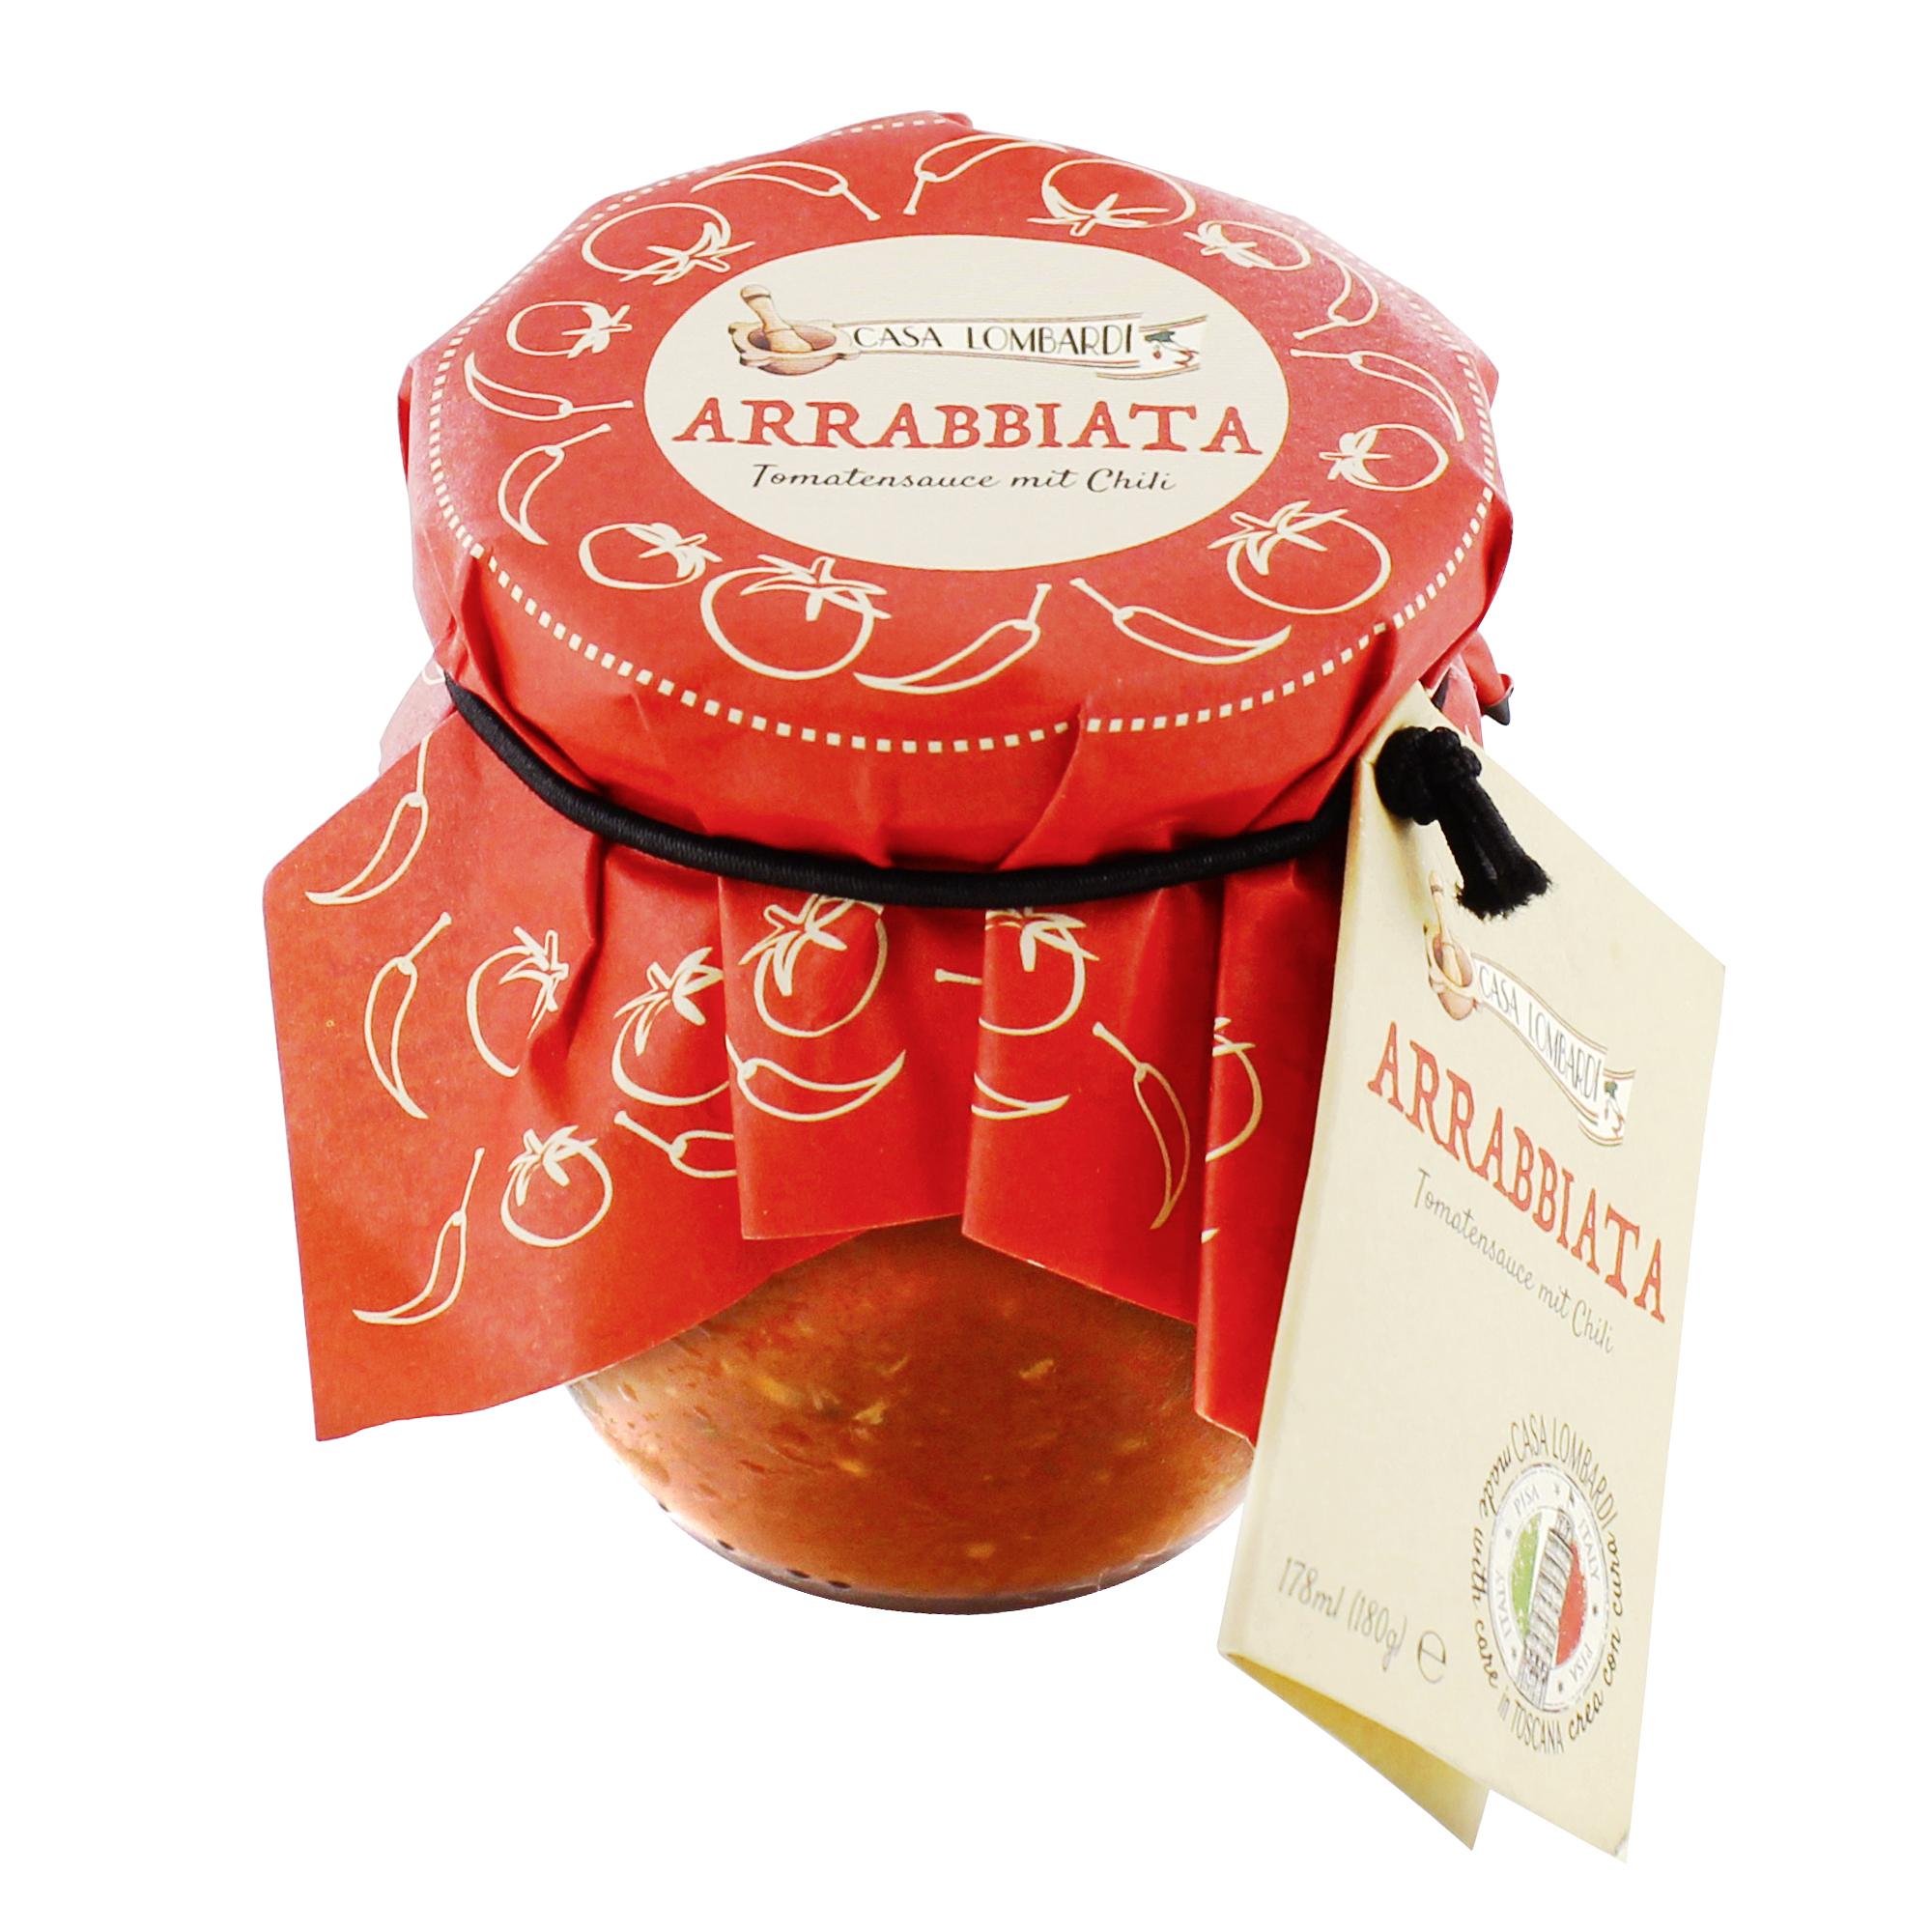 Crema Lombardi Arrabiata Sauce Chili 180g